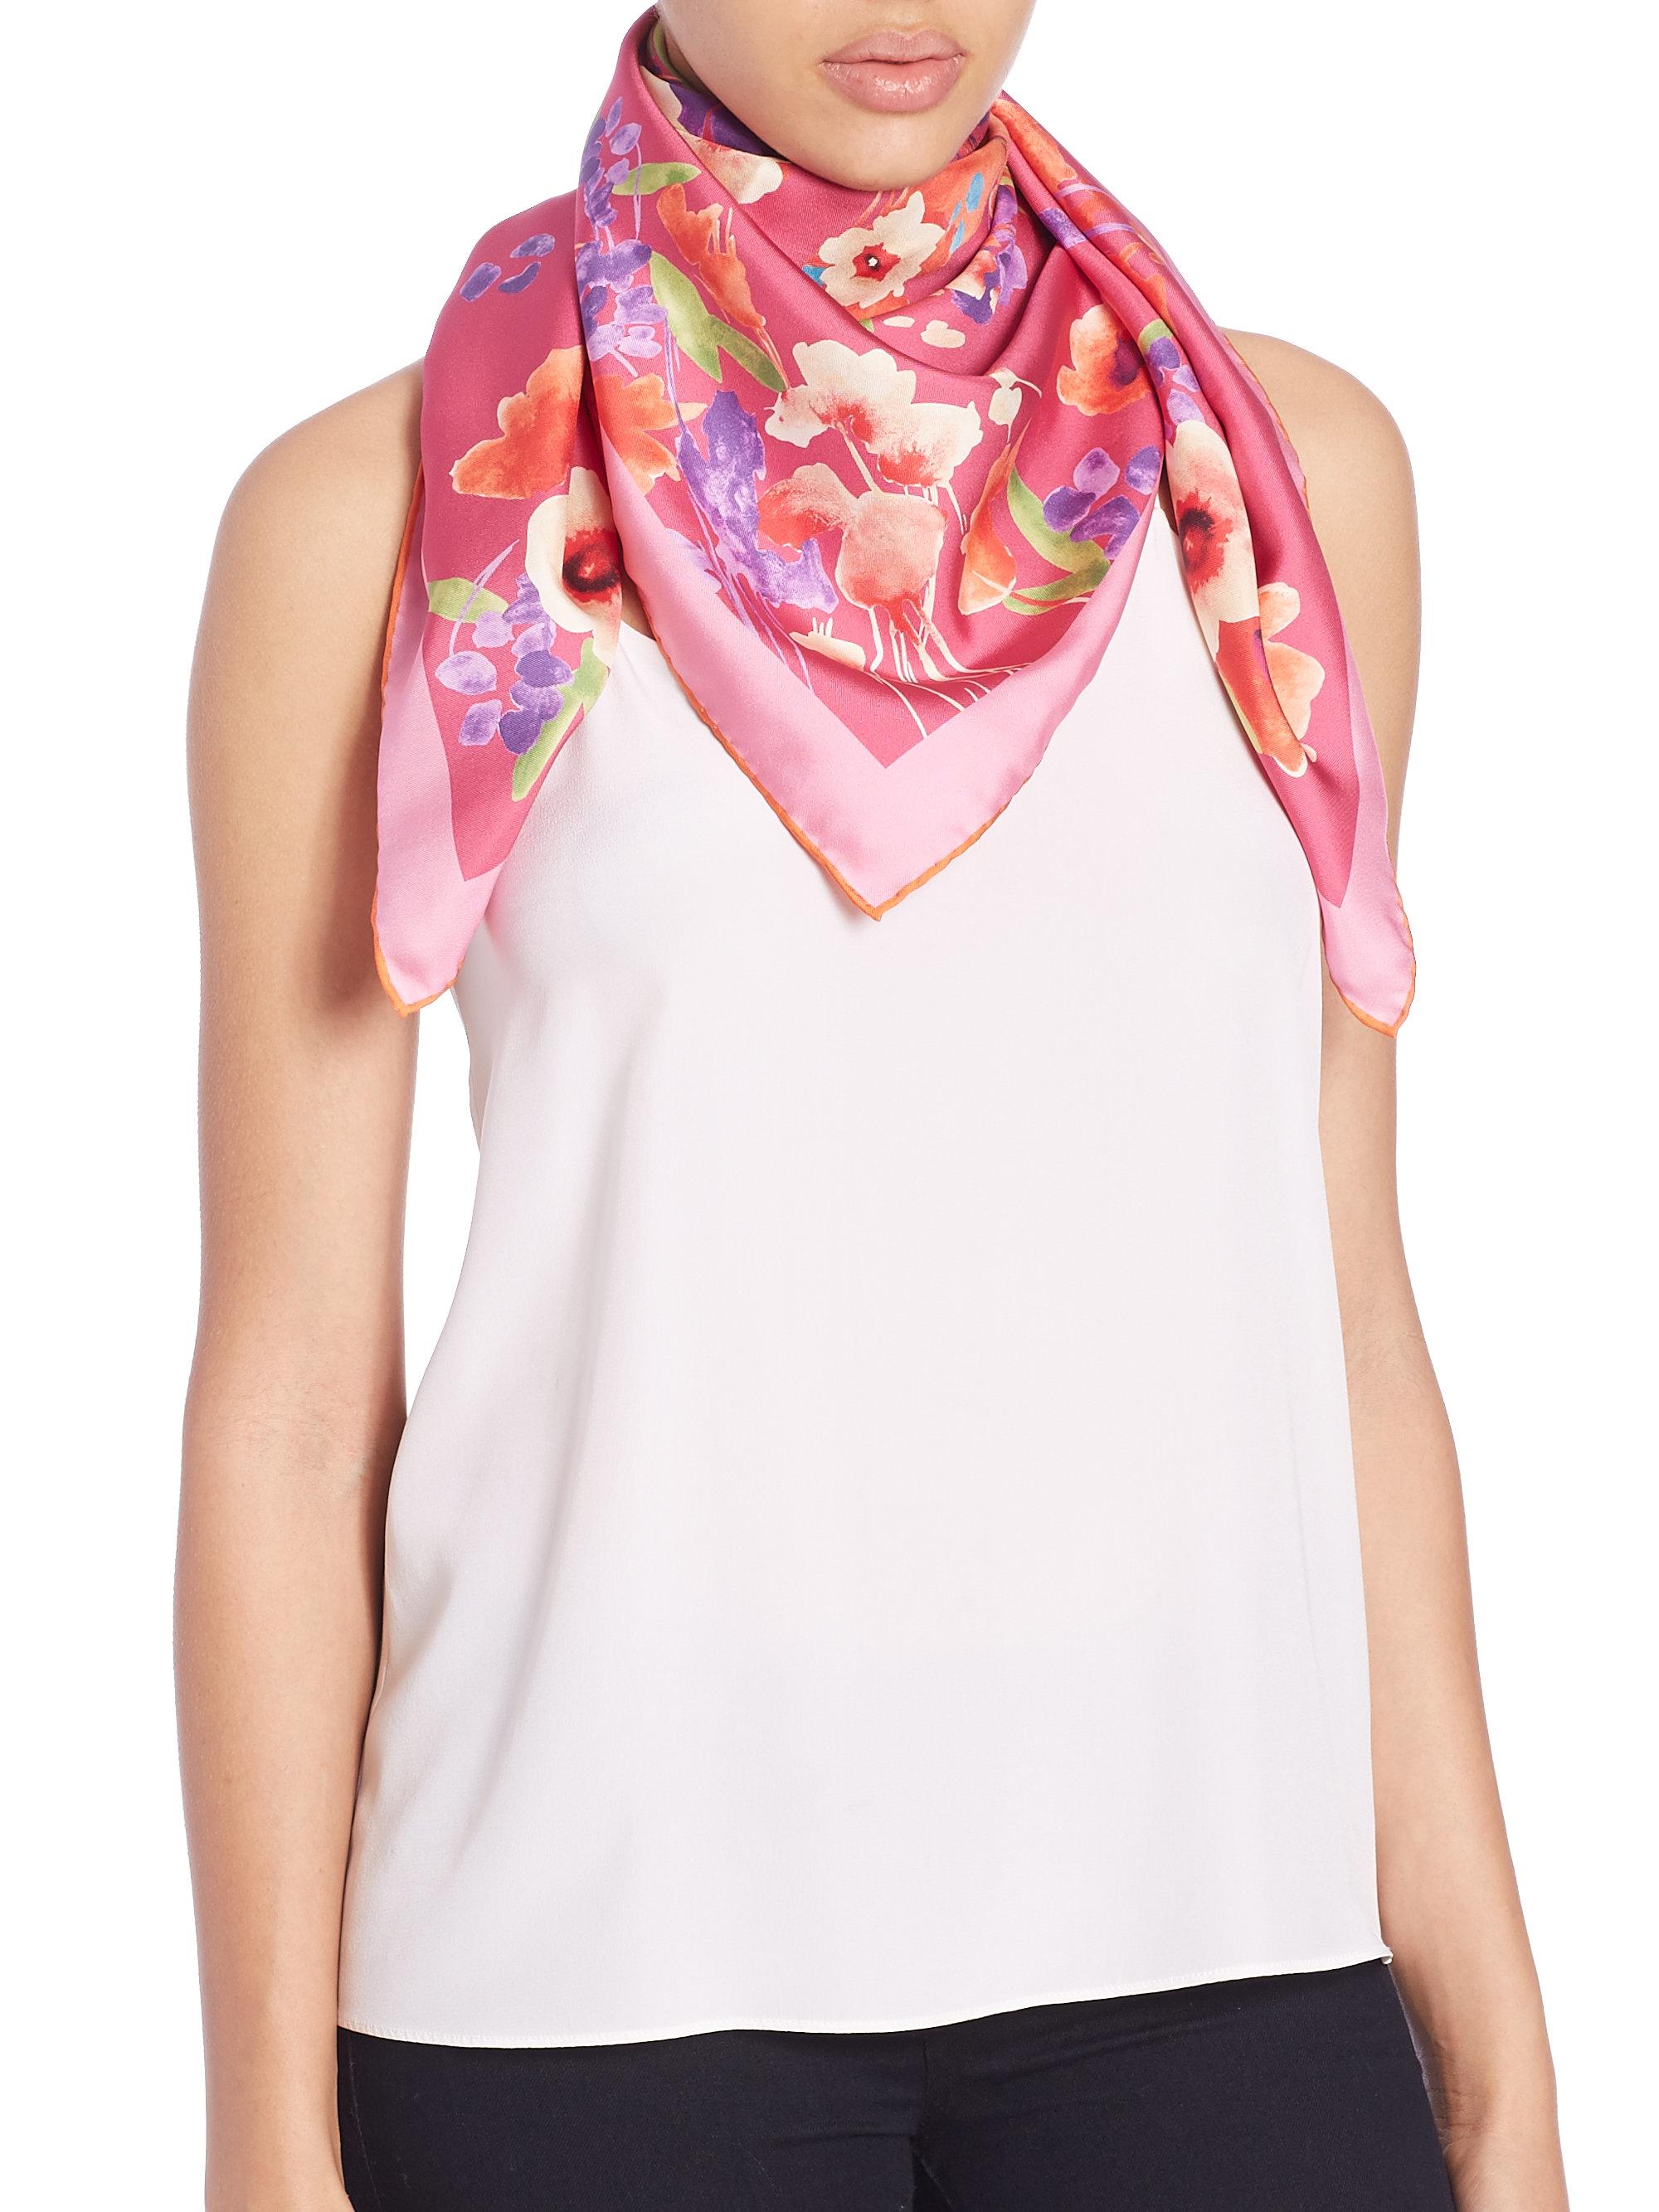 cavalli ferrari scarf silk fullscreen lyst chiffon cashmere print gauze printed roberto animal frayed franco accessories view